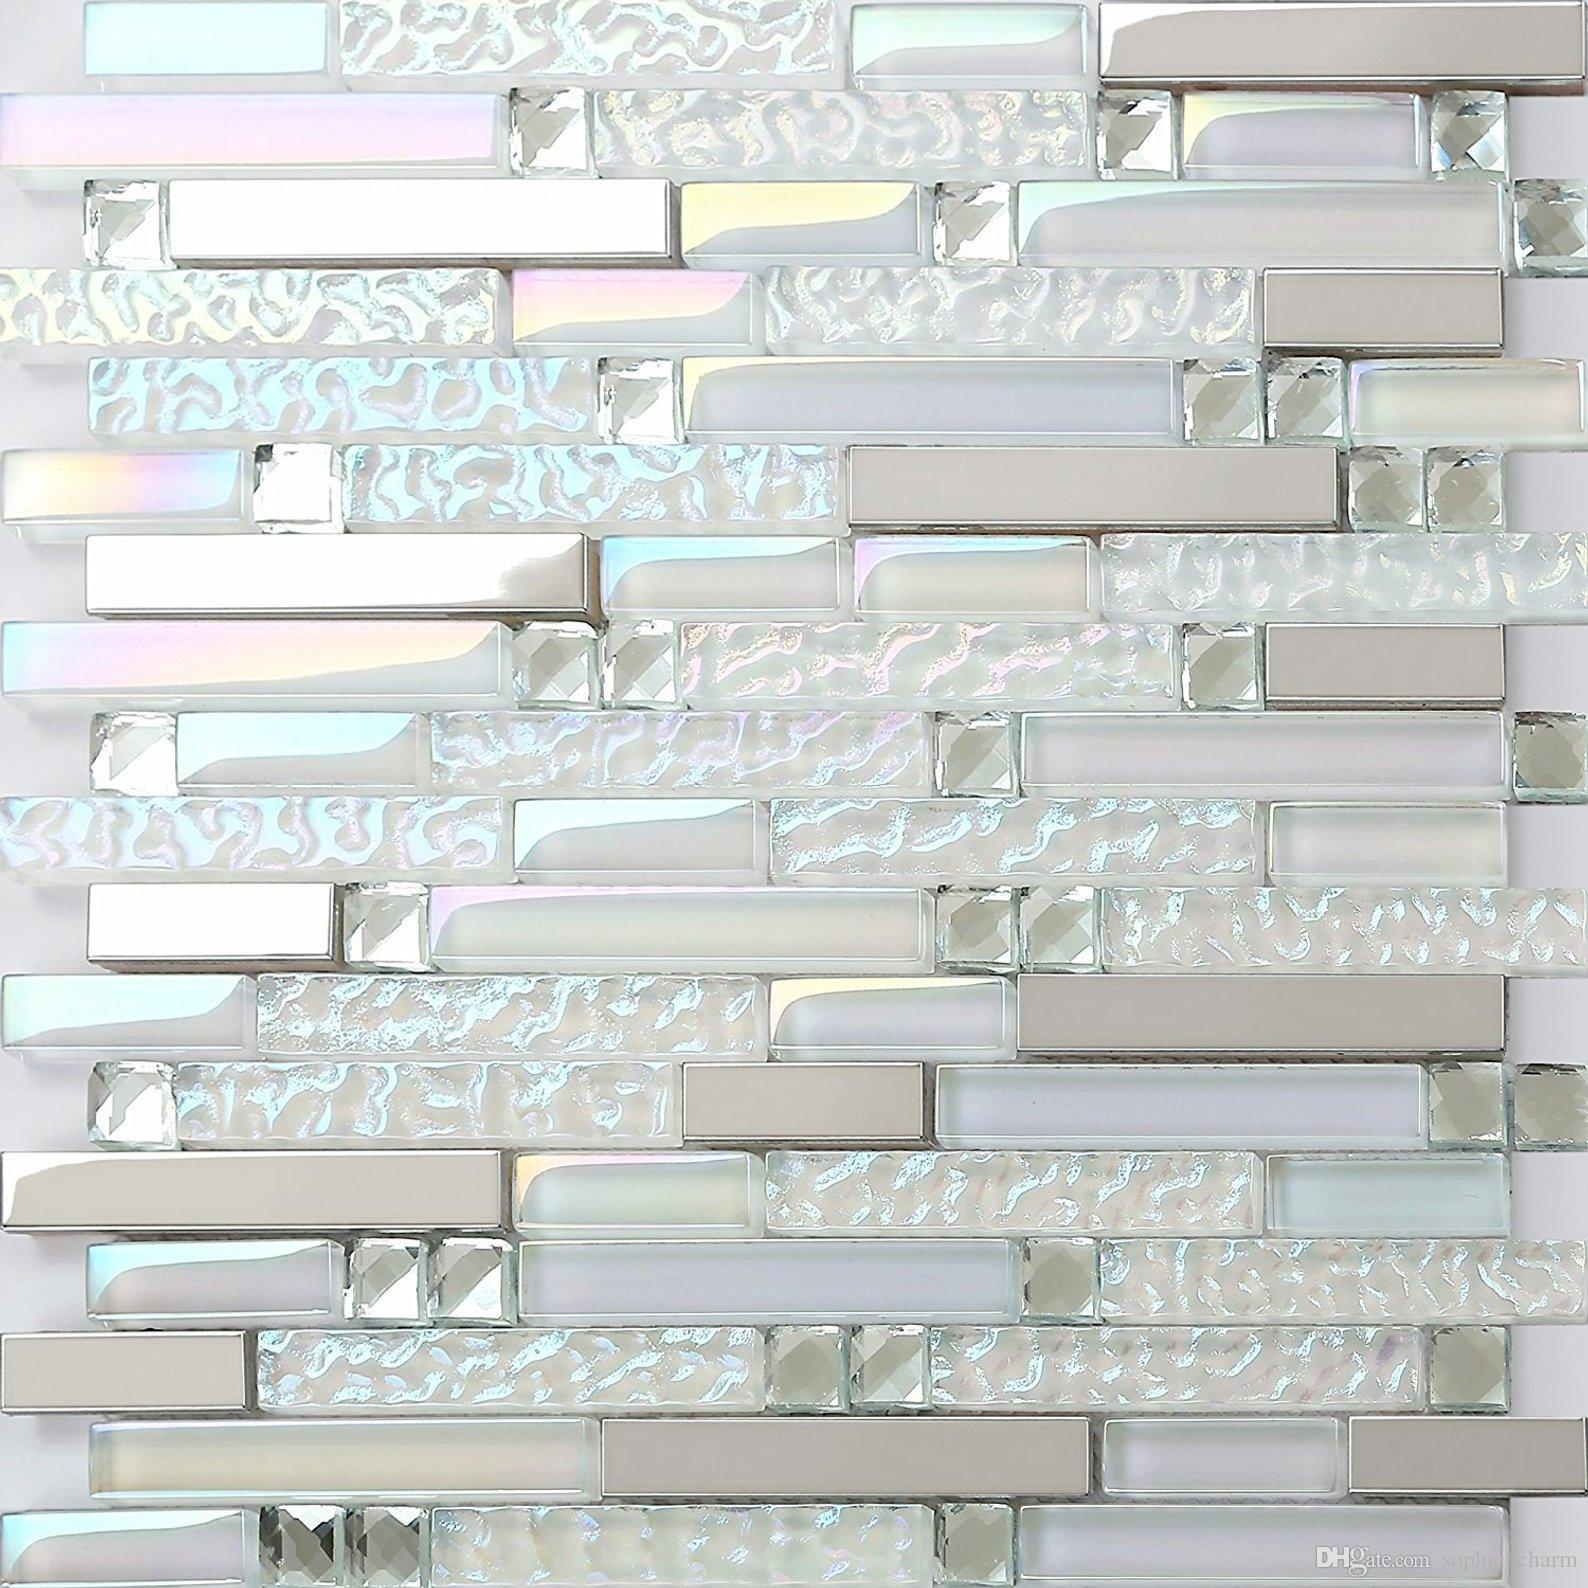 2020 Glass Mosaic Kitchen Tile Backsplash Bathroom Shower Wall Tiles Ssmt399 Silver Metal Stainless Steel Mosaic From Sophie Charm 14 27 Dhgate Com